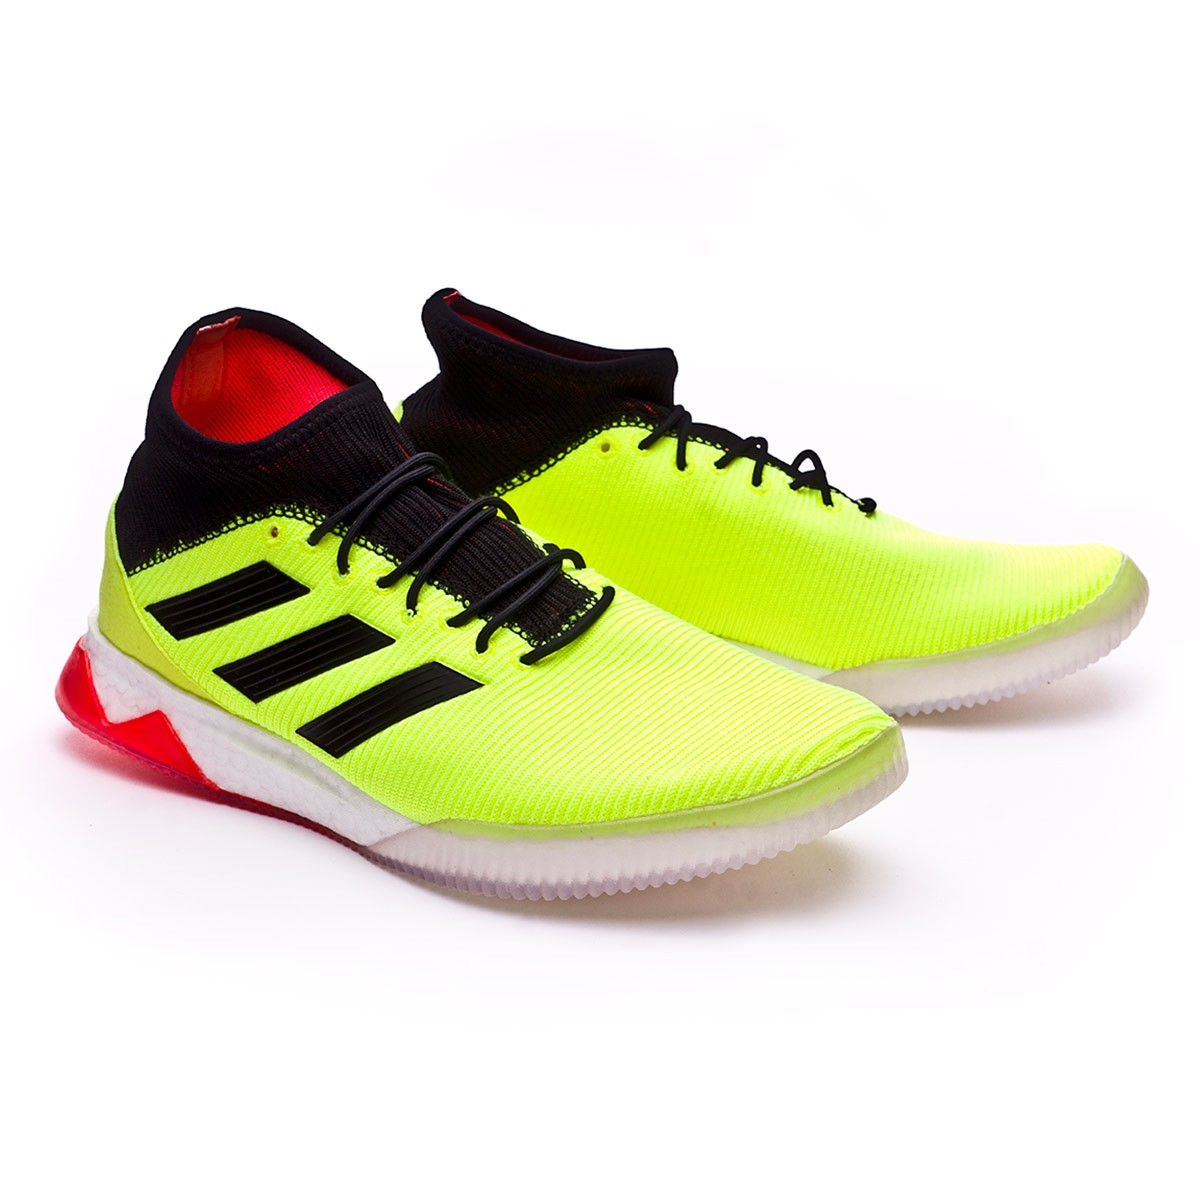 fe252d5d2f0 adidas Predator Tango 18.1 TR Trainers. Solar yellow-Black-Solar red ...